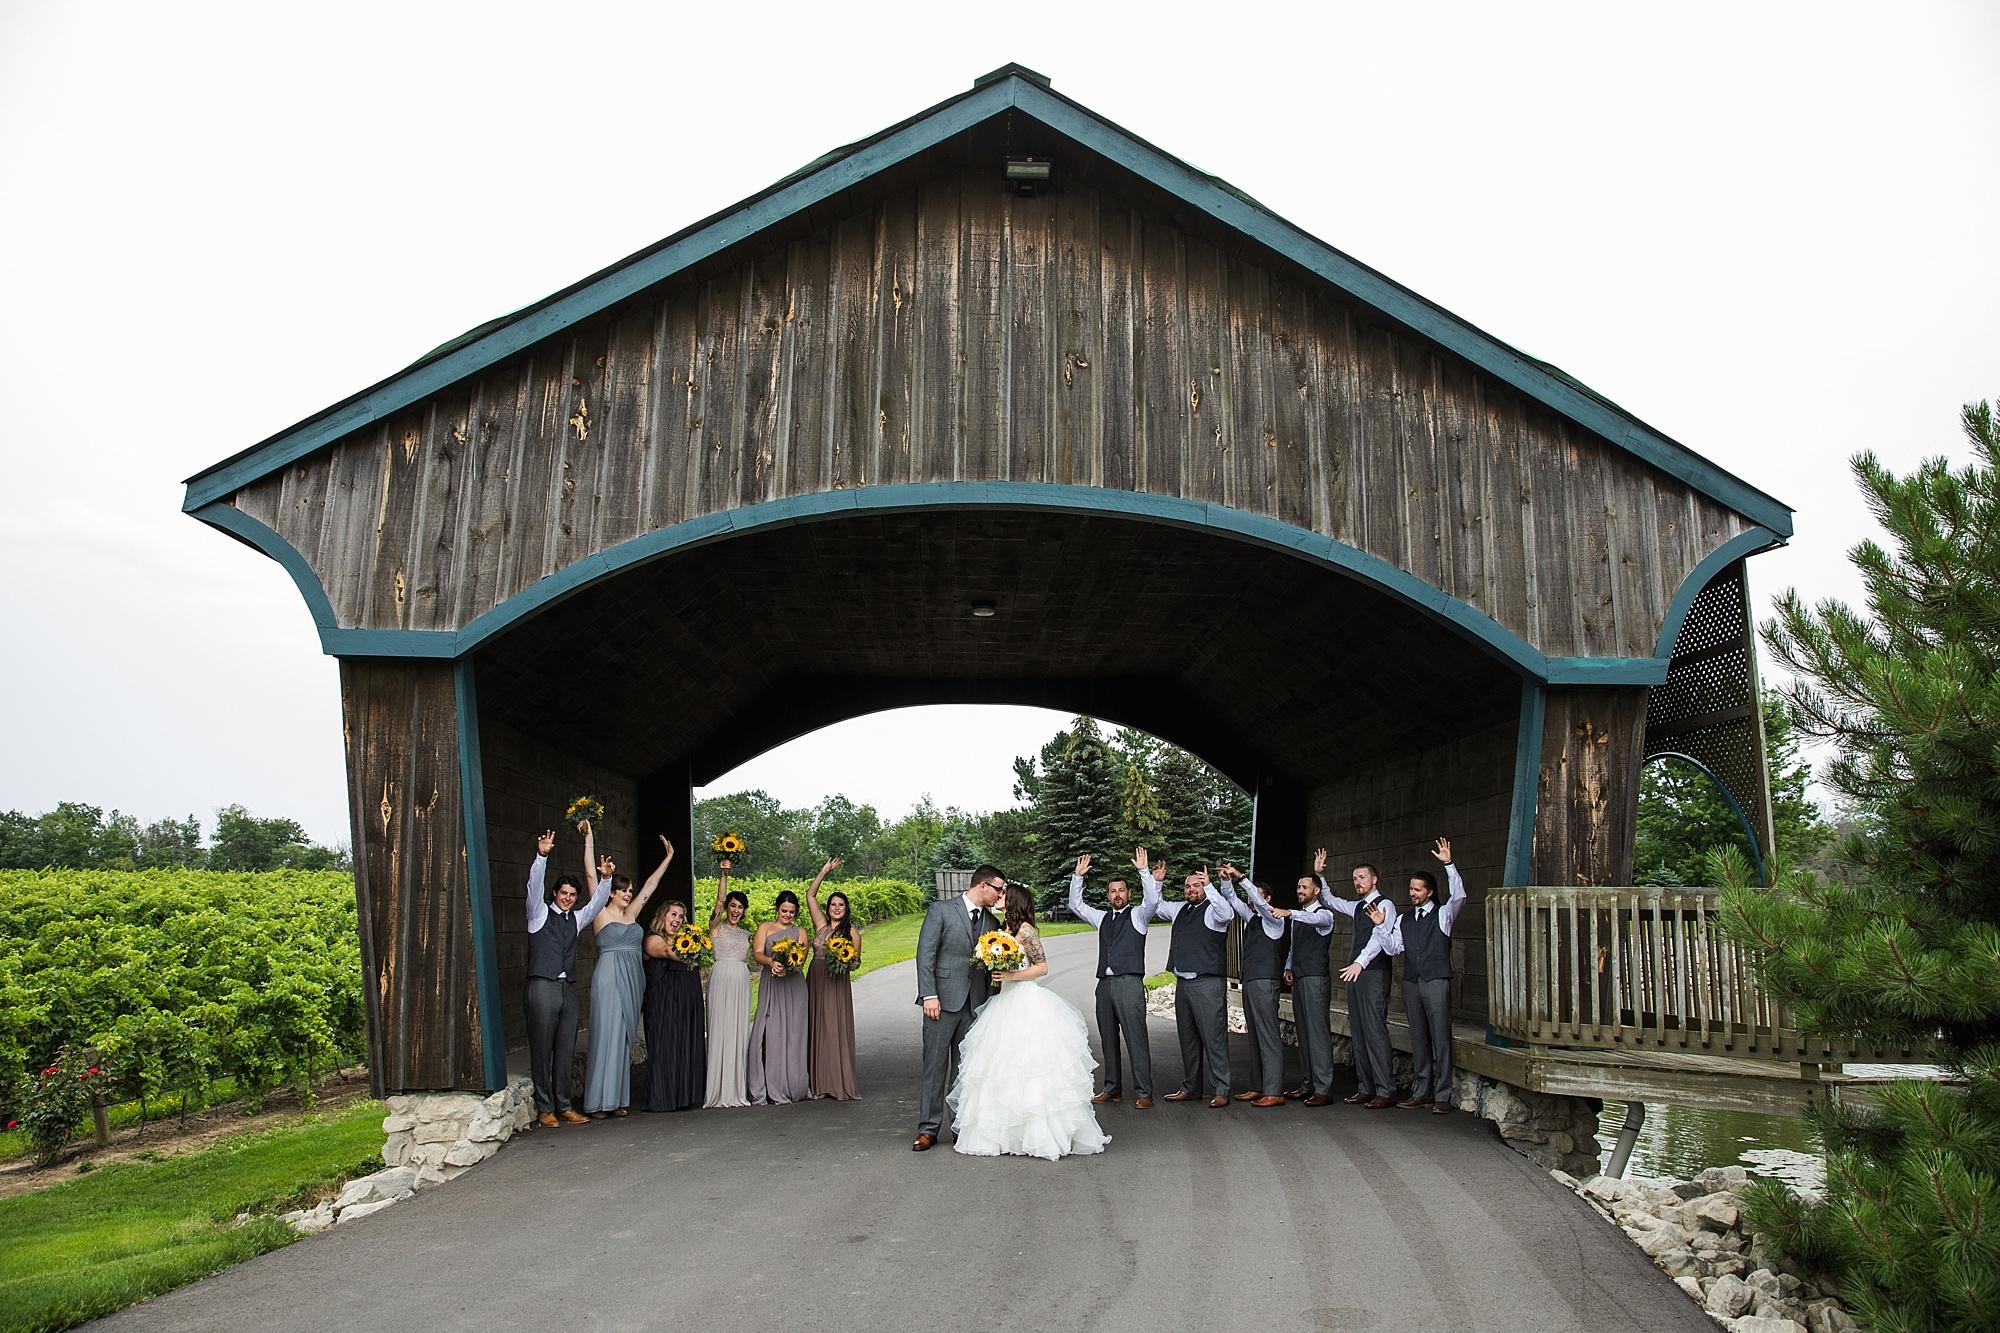 lipapark-hernderwinery-wedding_0036.jpg